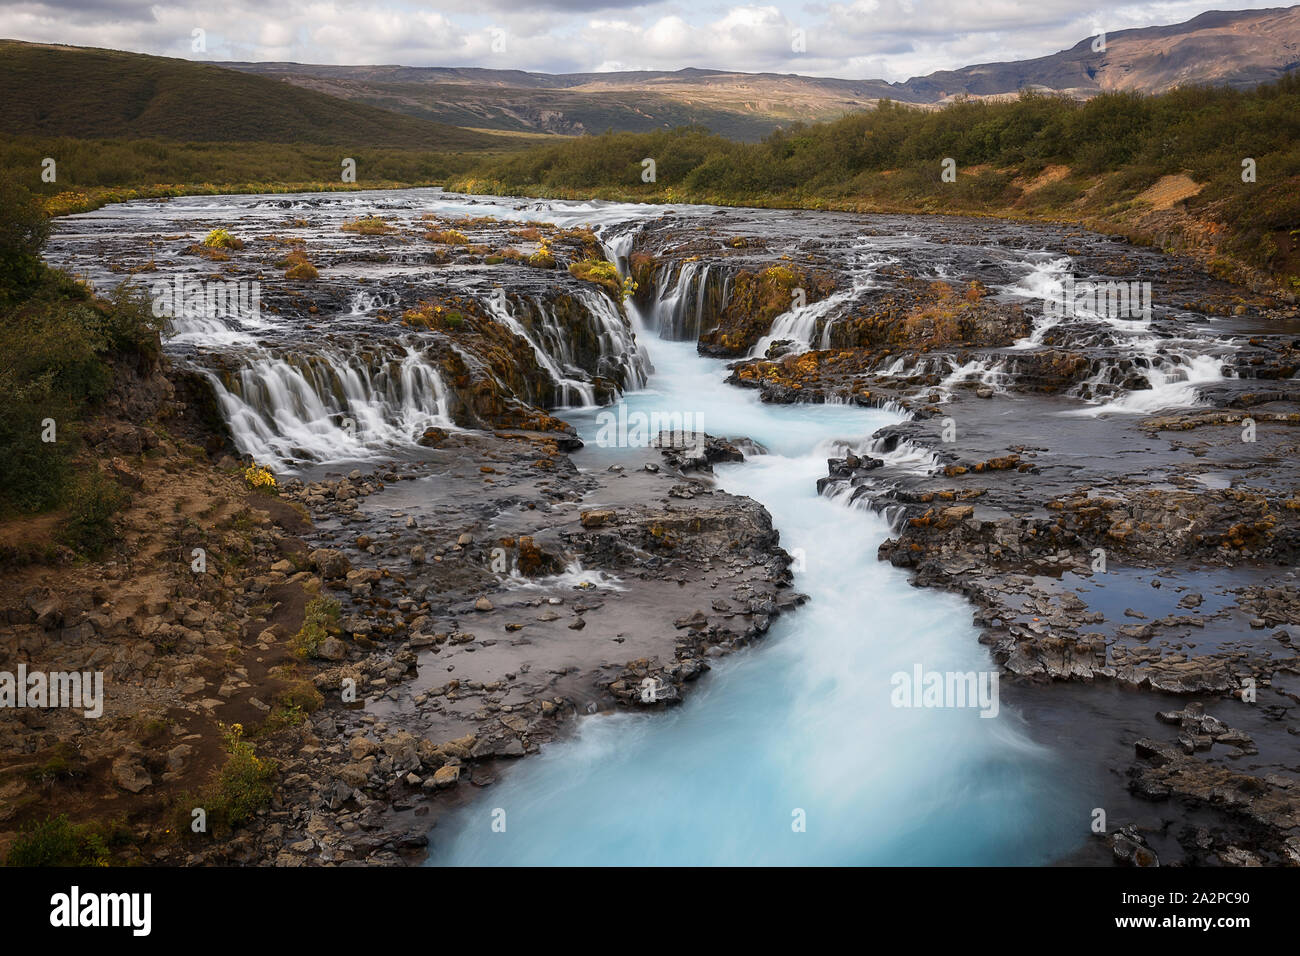 Hermosa Cascada Bruarfoss turquesa, Islandia Foto de stock